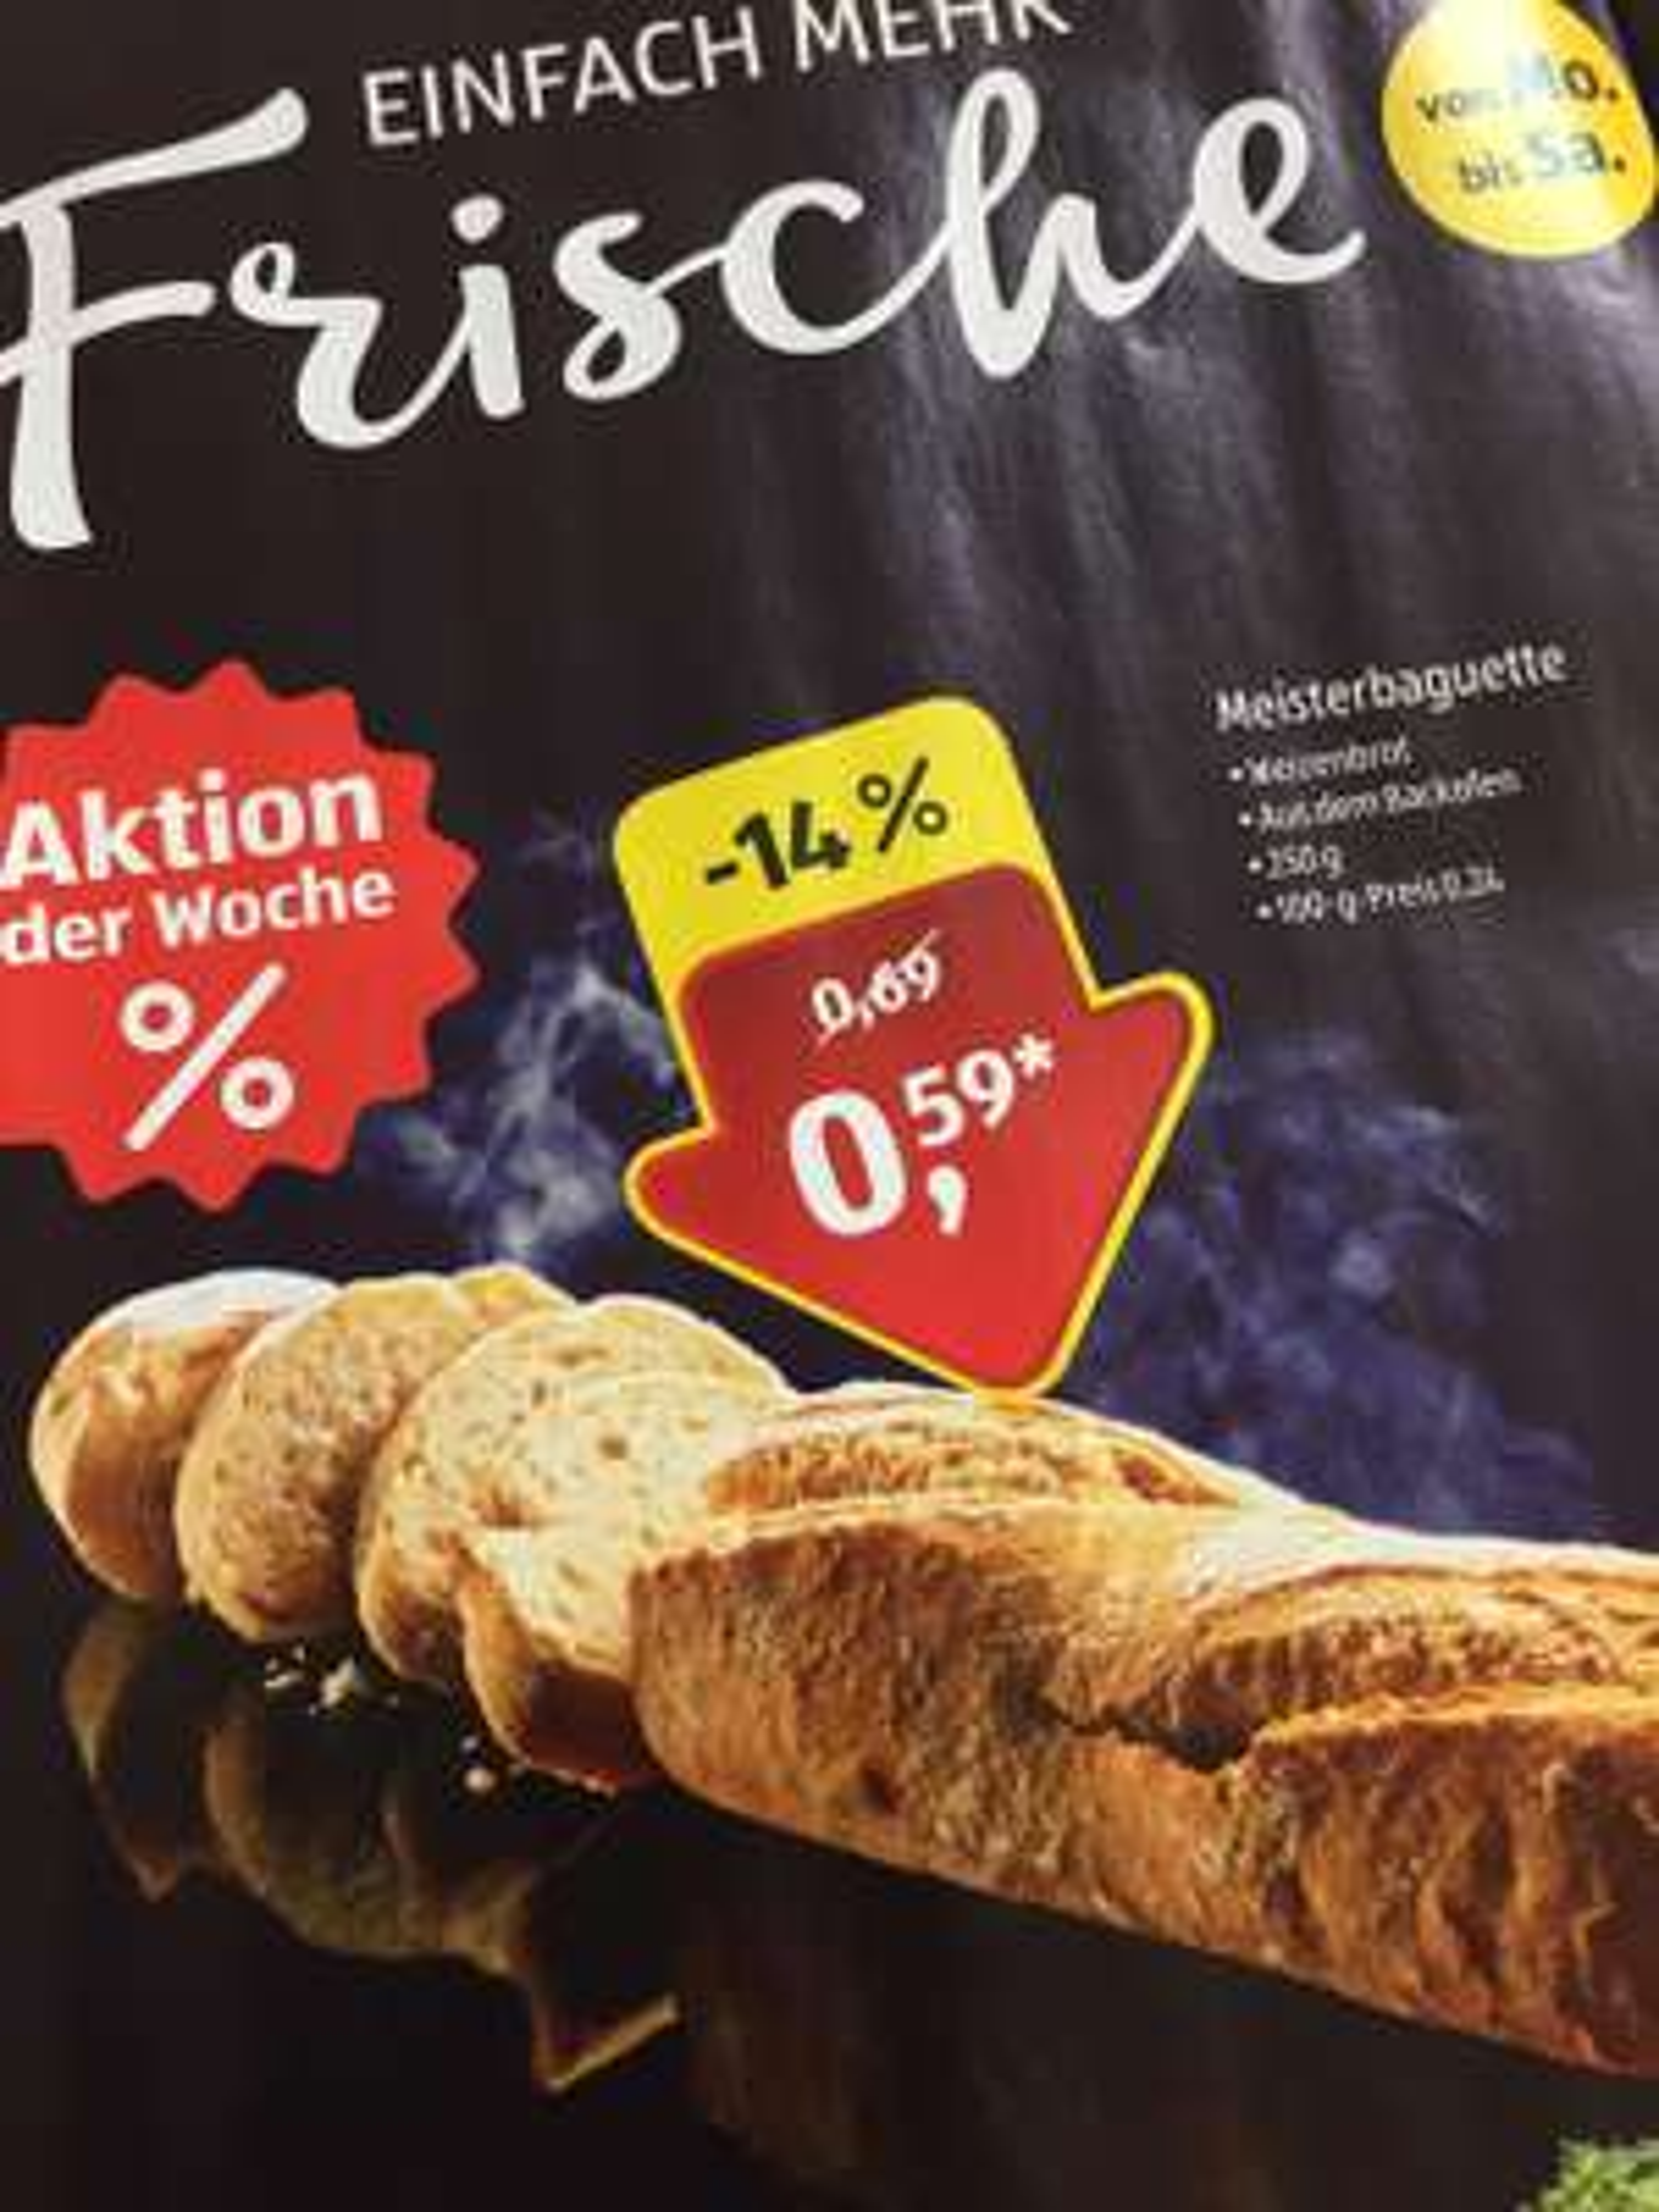 Meisterbaguette 250g 0,59€ ab 09.07-14.07 bei Aldi Süd